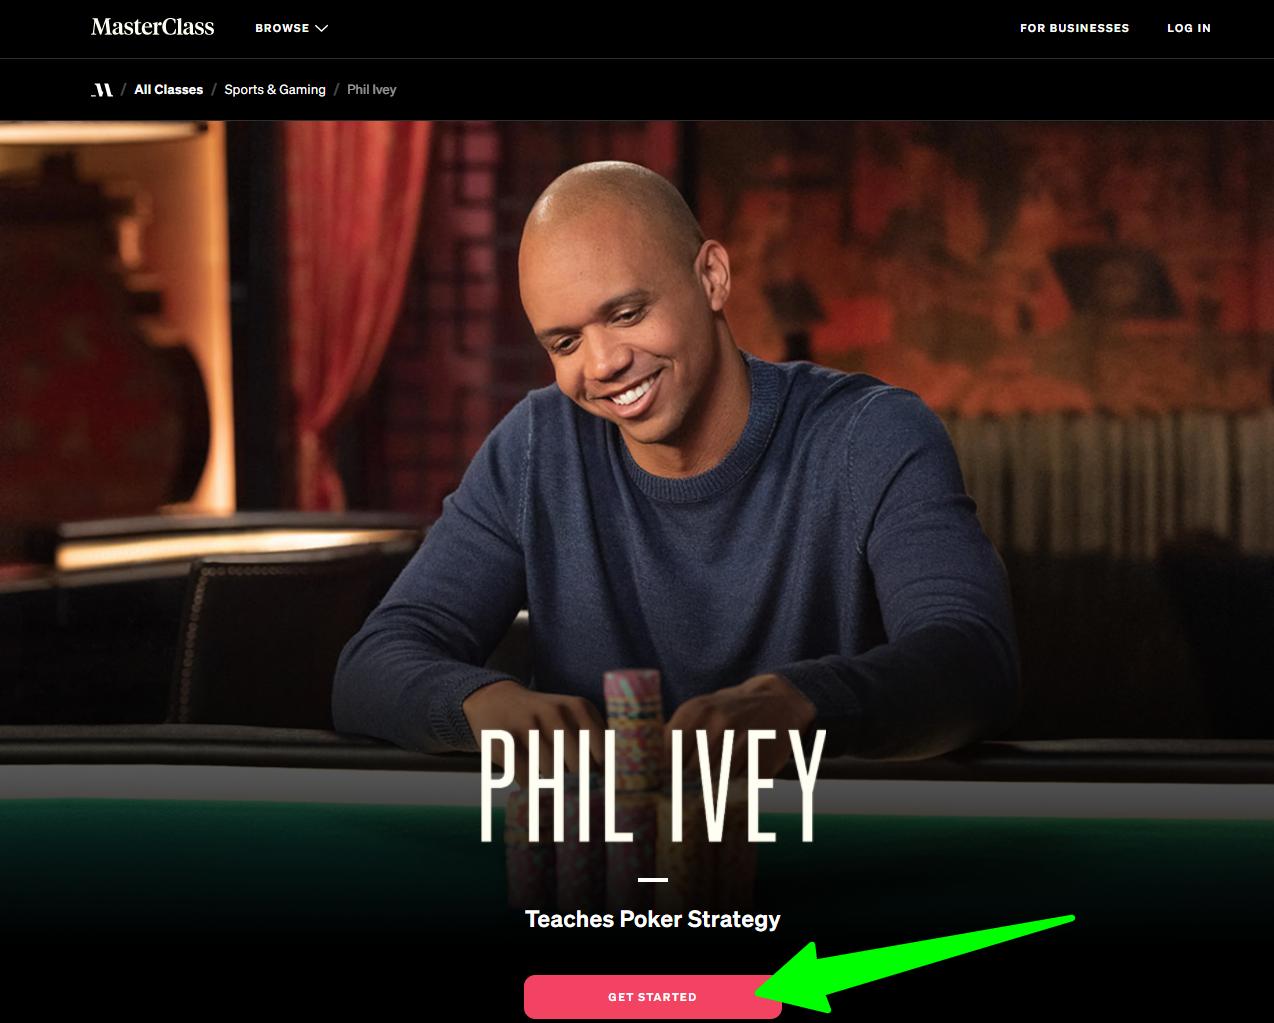 MasterClass-Phil-Ivey-Teaches Poker